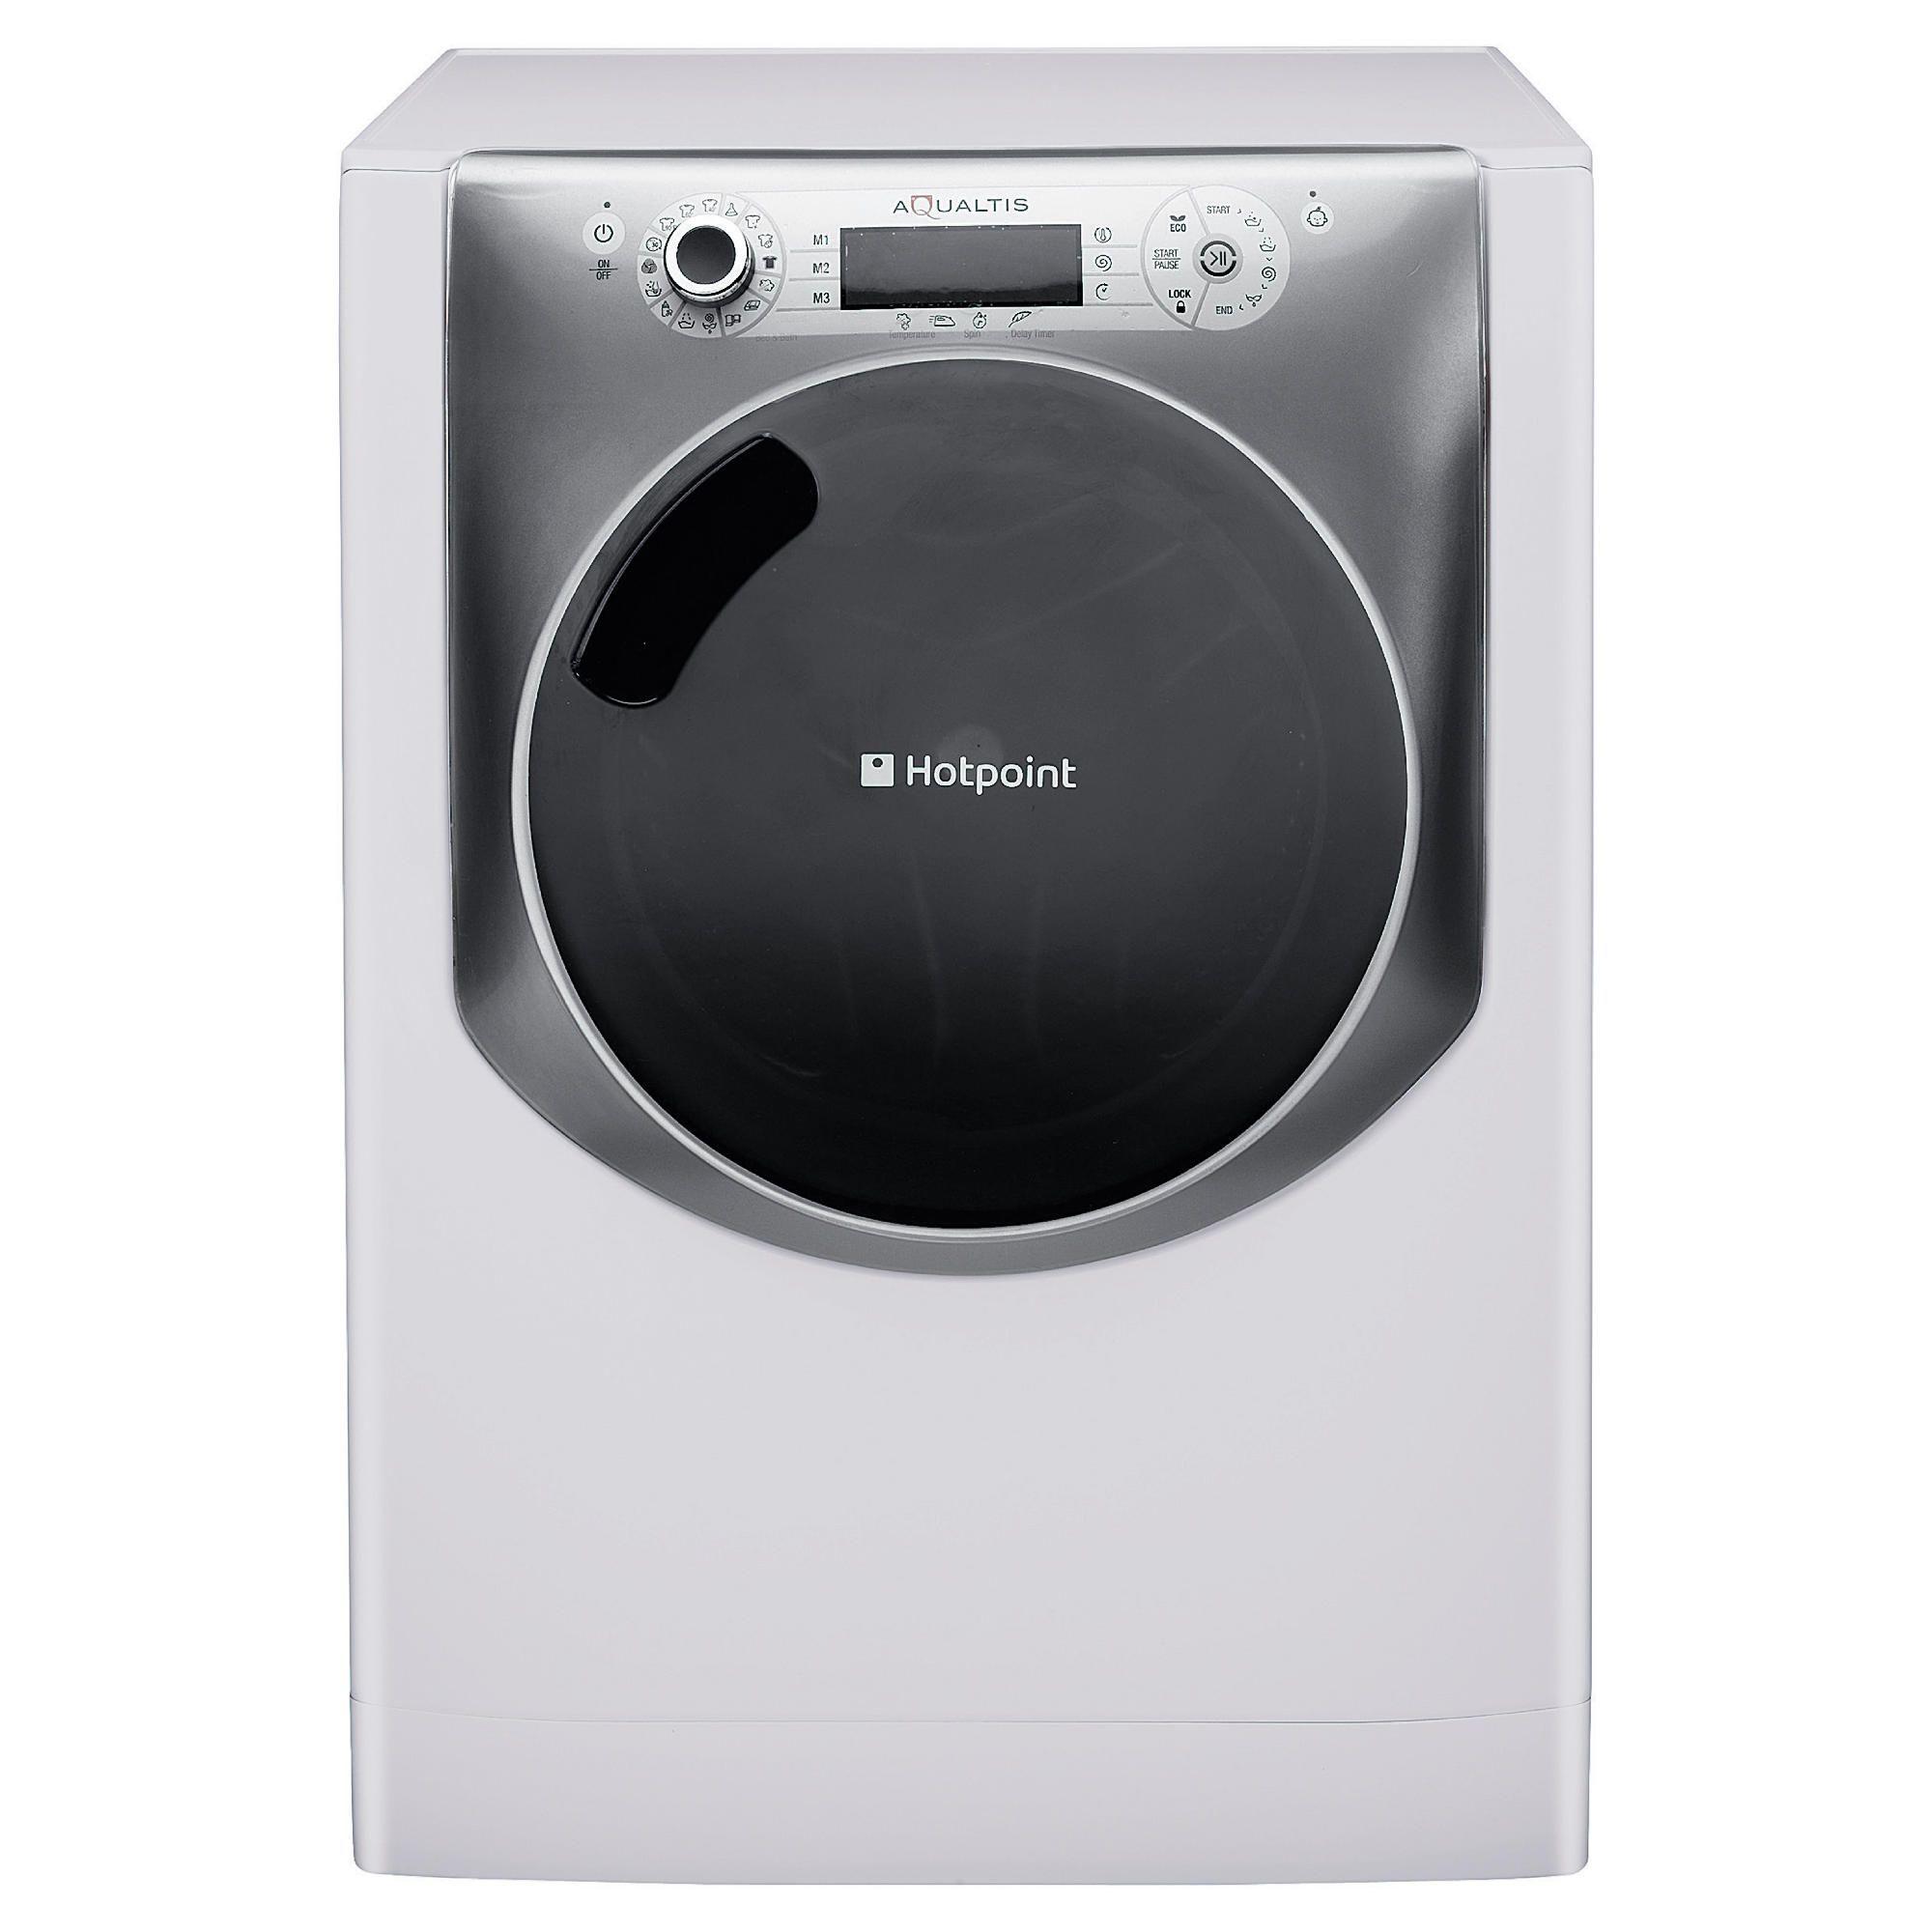 hotpoint aqualtis aq113l297e washing machine 11kg wash load 1200